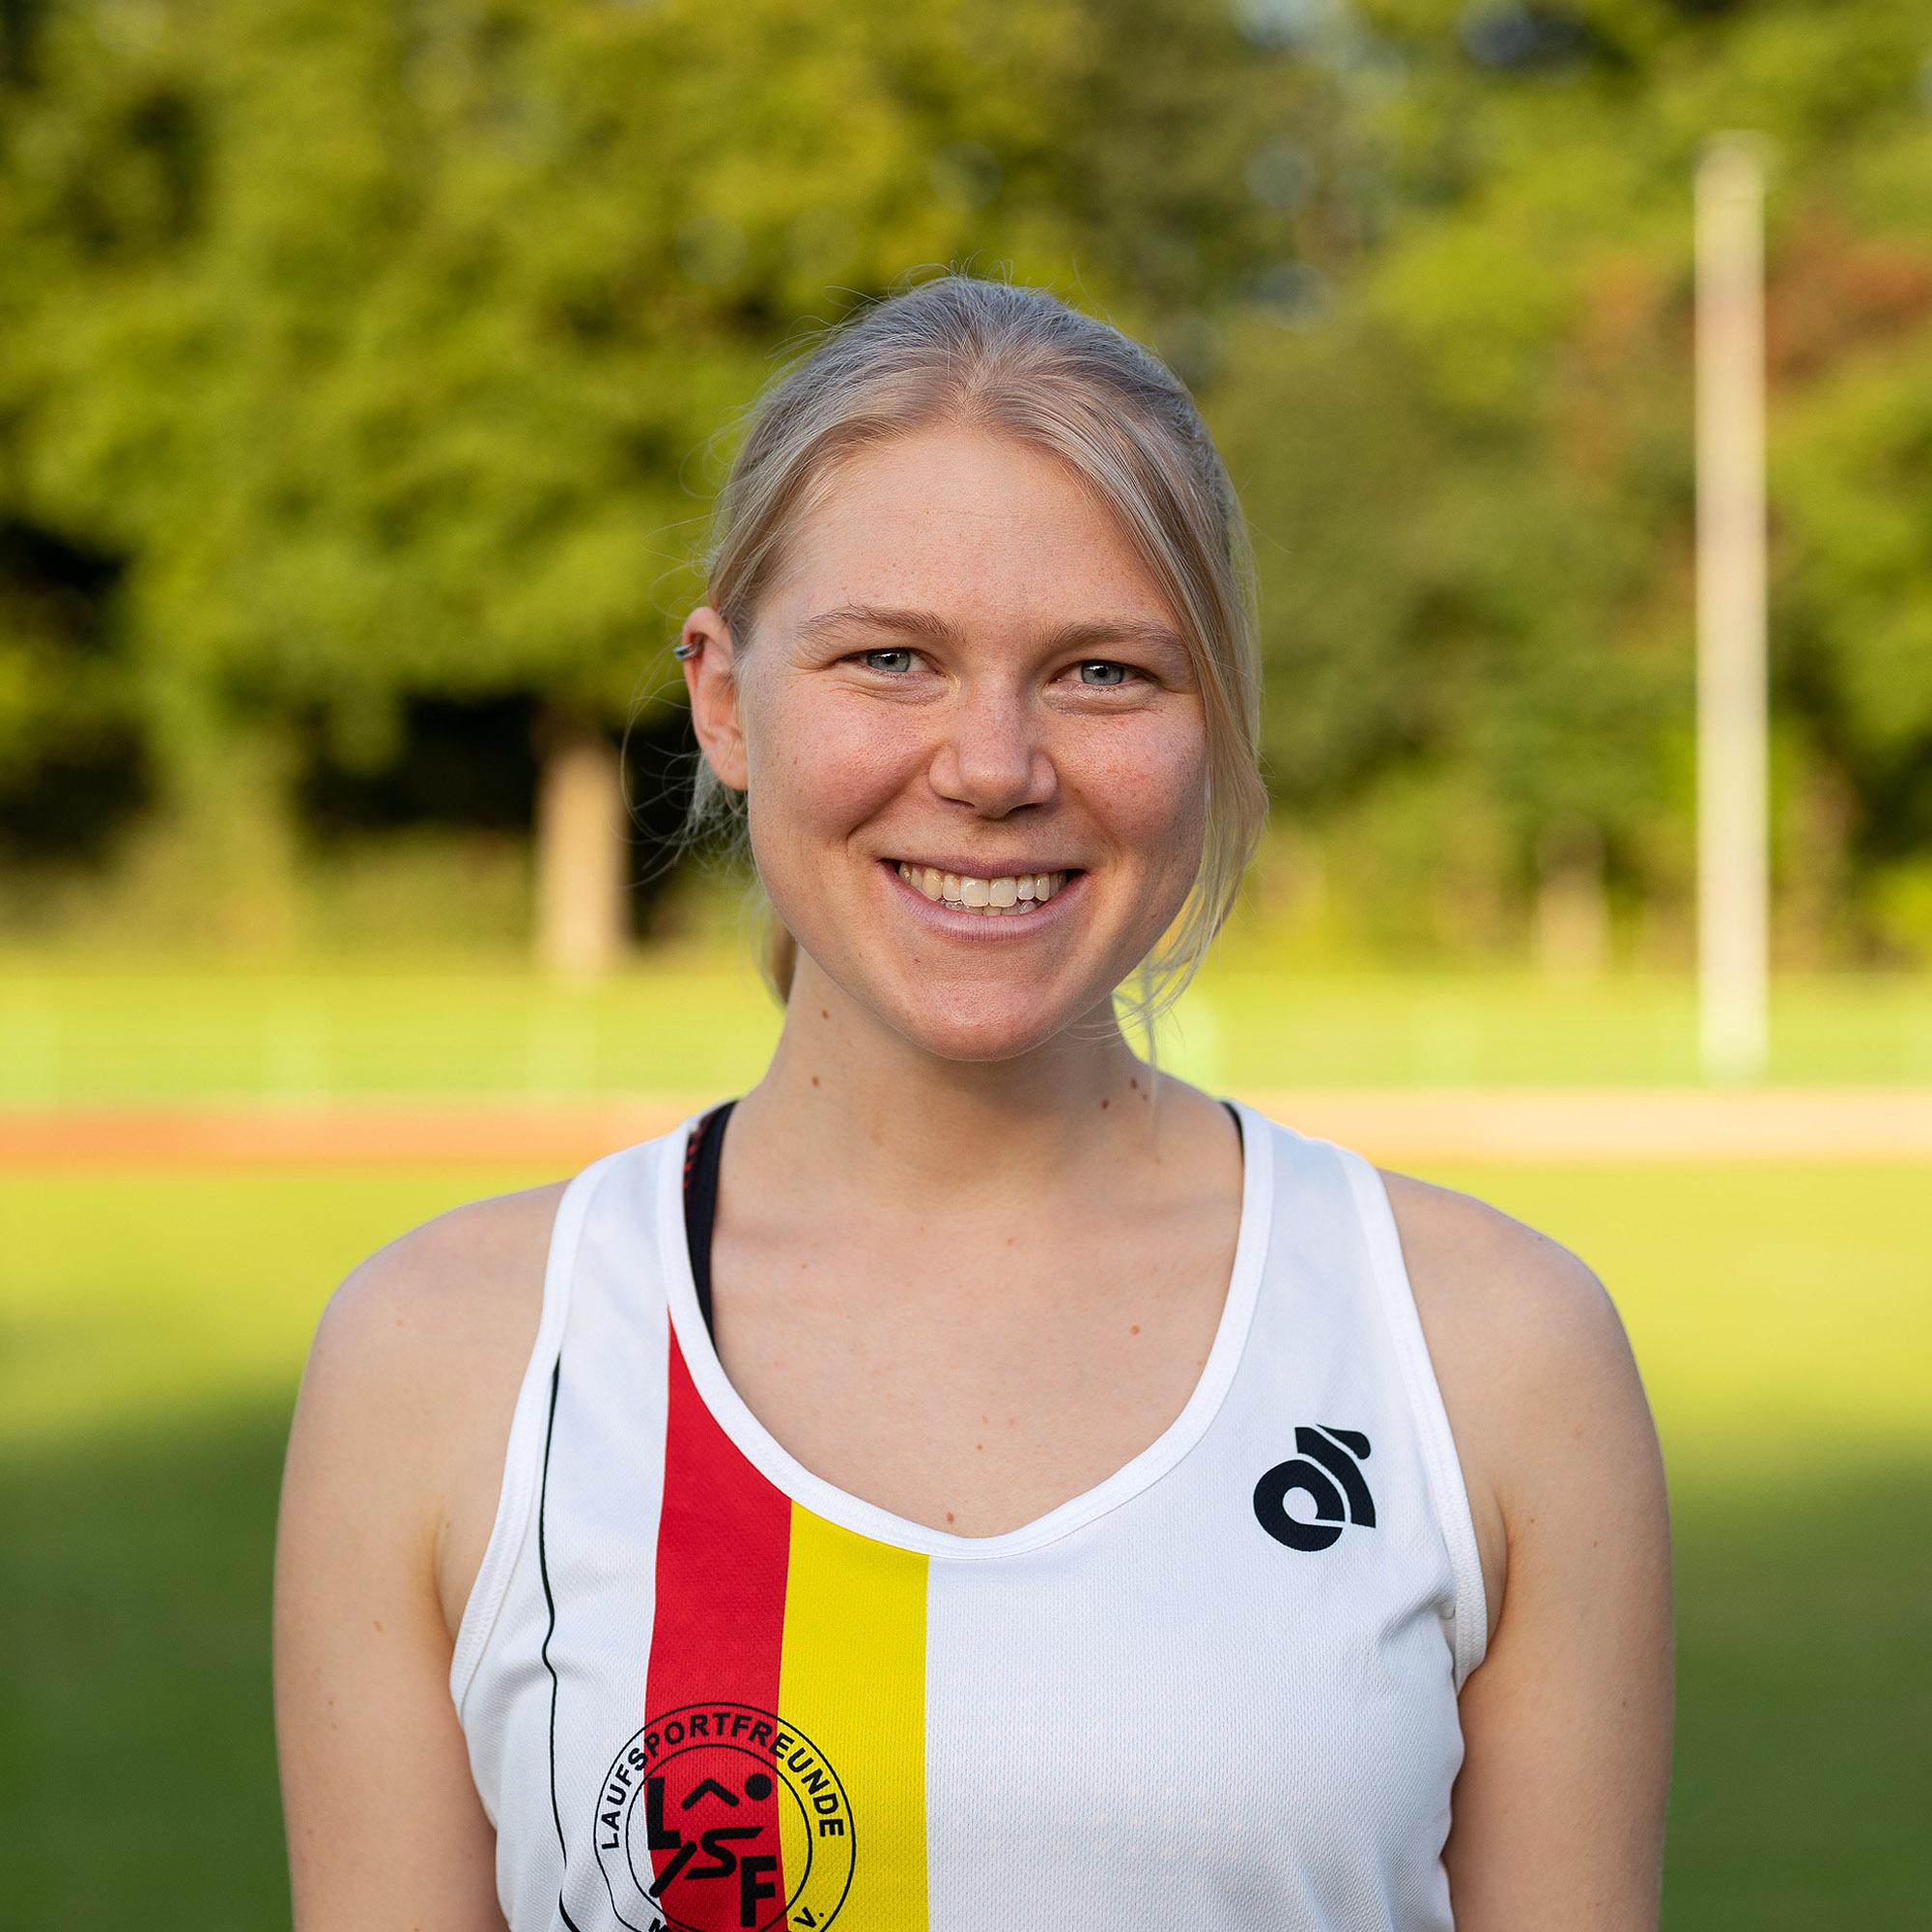 Farina Lennartz